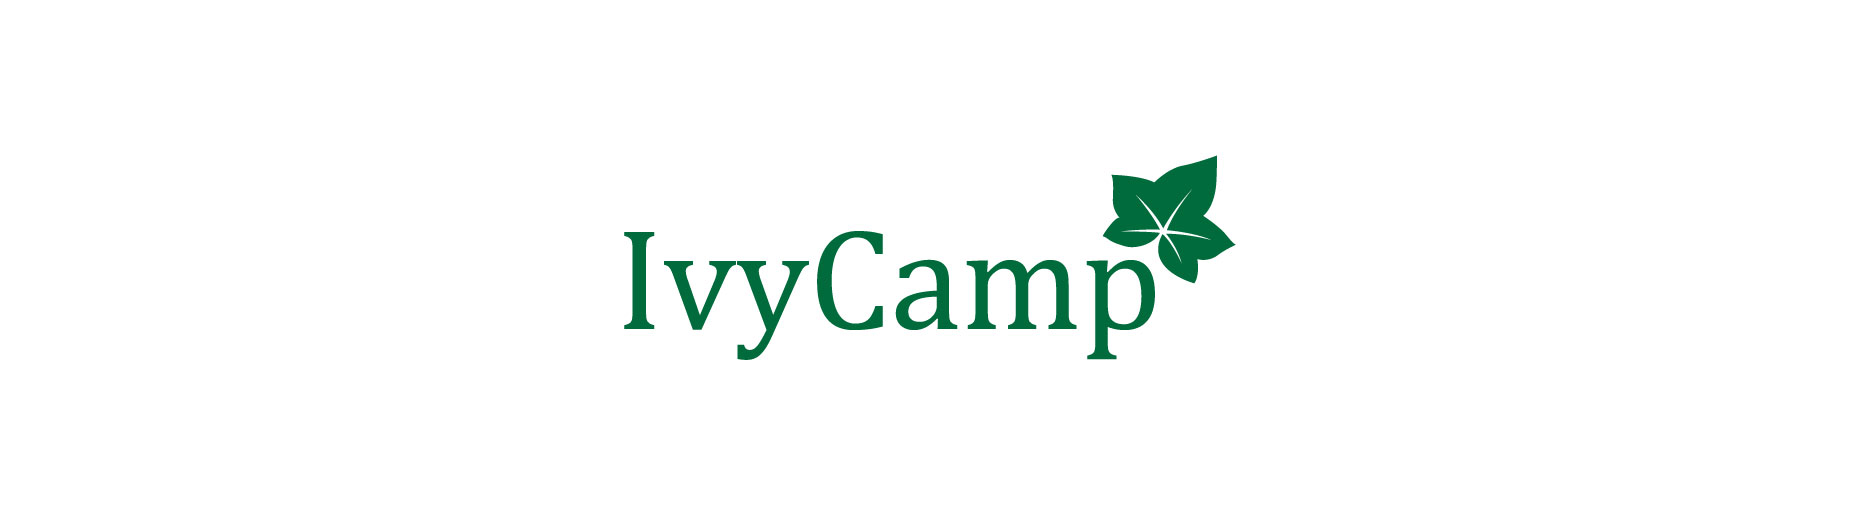 IvyCamp